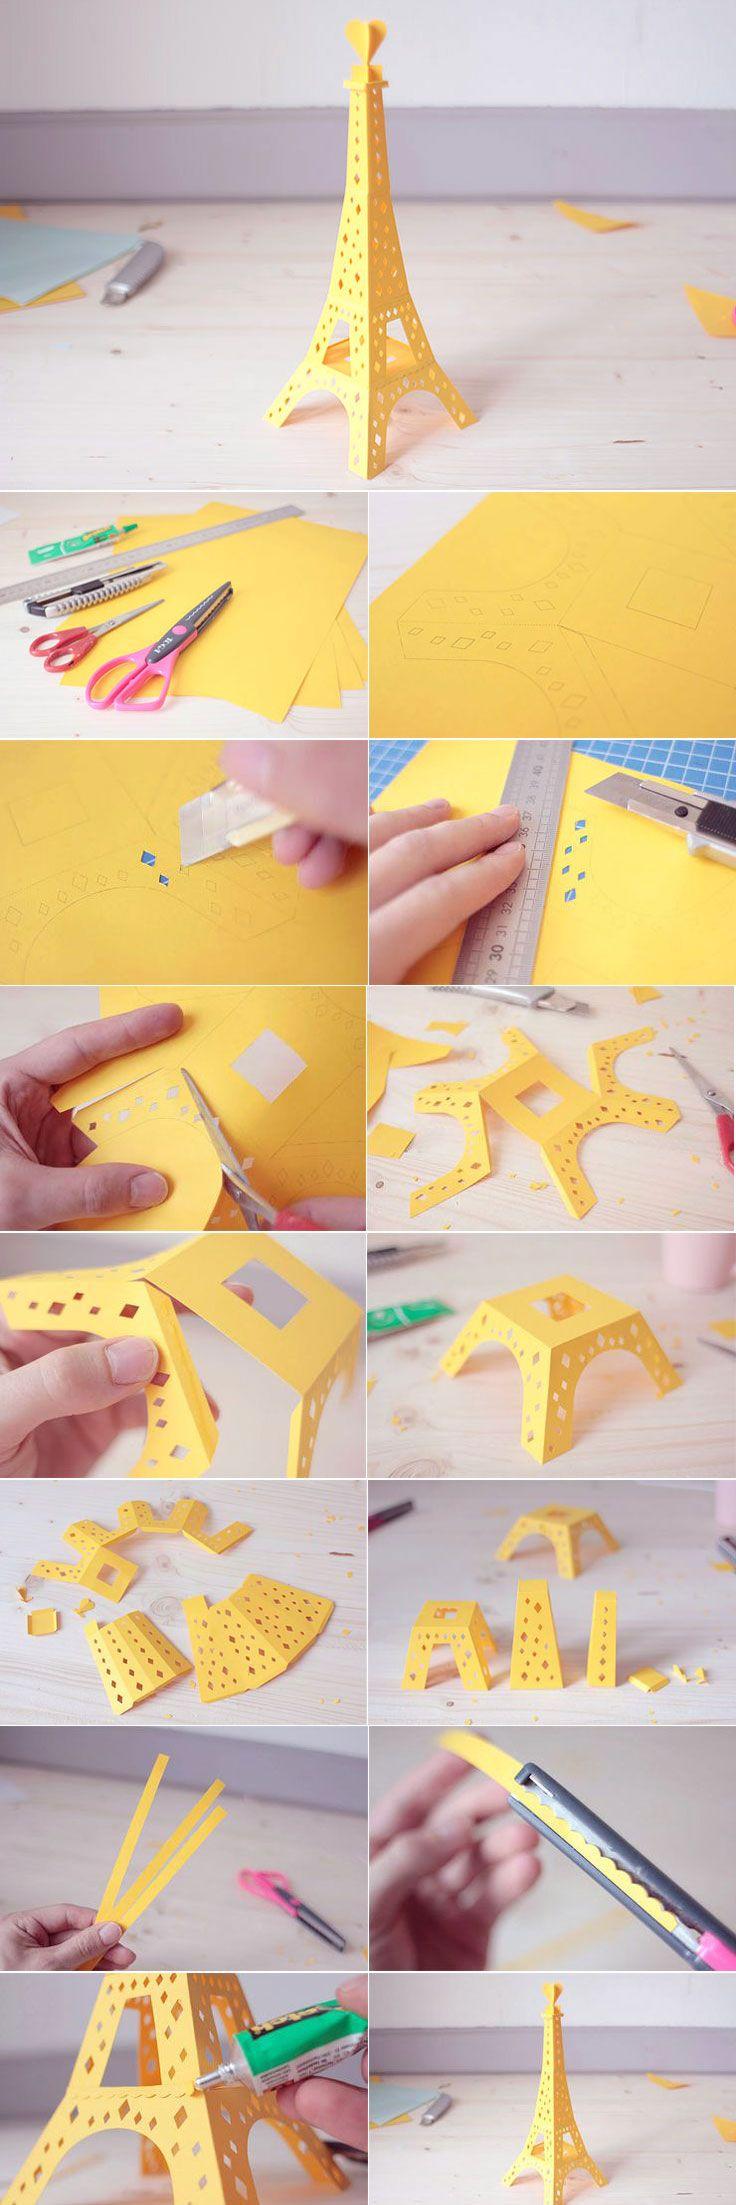 Scrapbook paper eiffel tower - Lorenzo P Pour Make My Lemonade Http Makemylemonade Com The Eiffel Tower